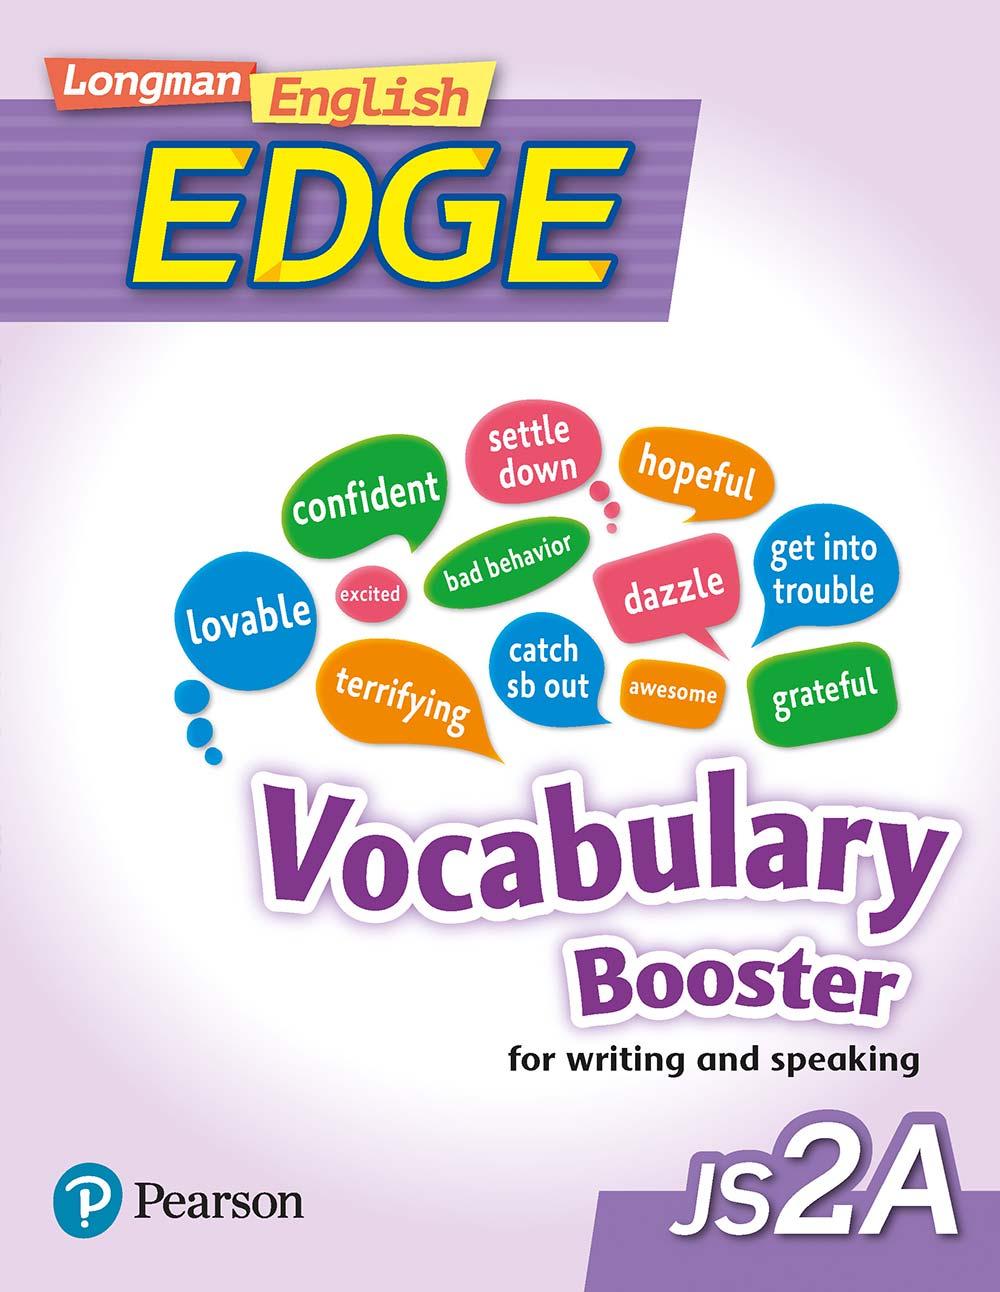 Longman English Edge JS2A Vocabulary Booster